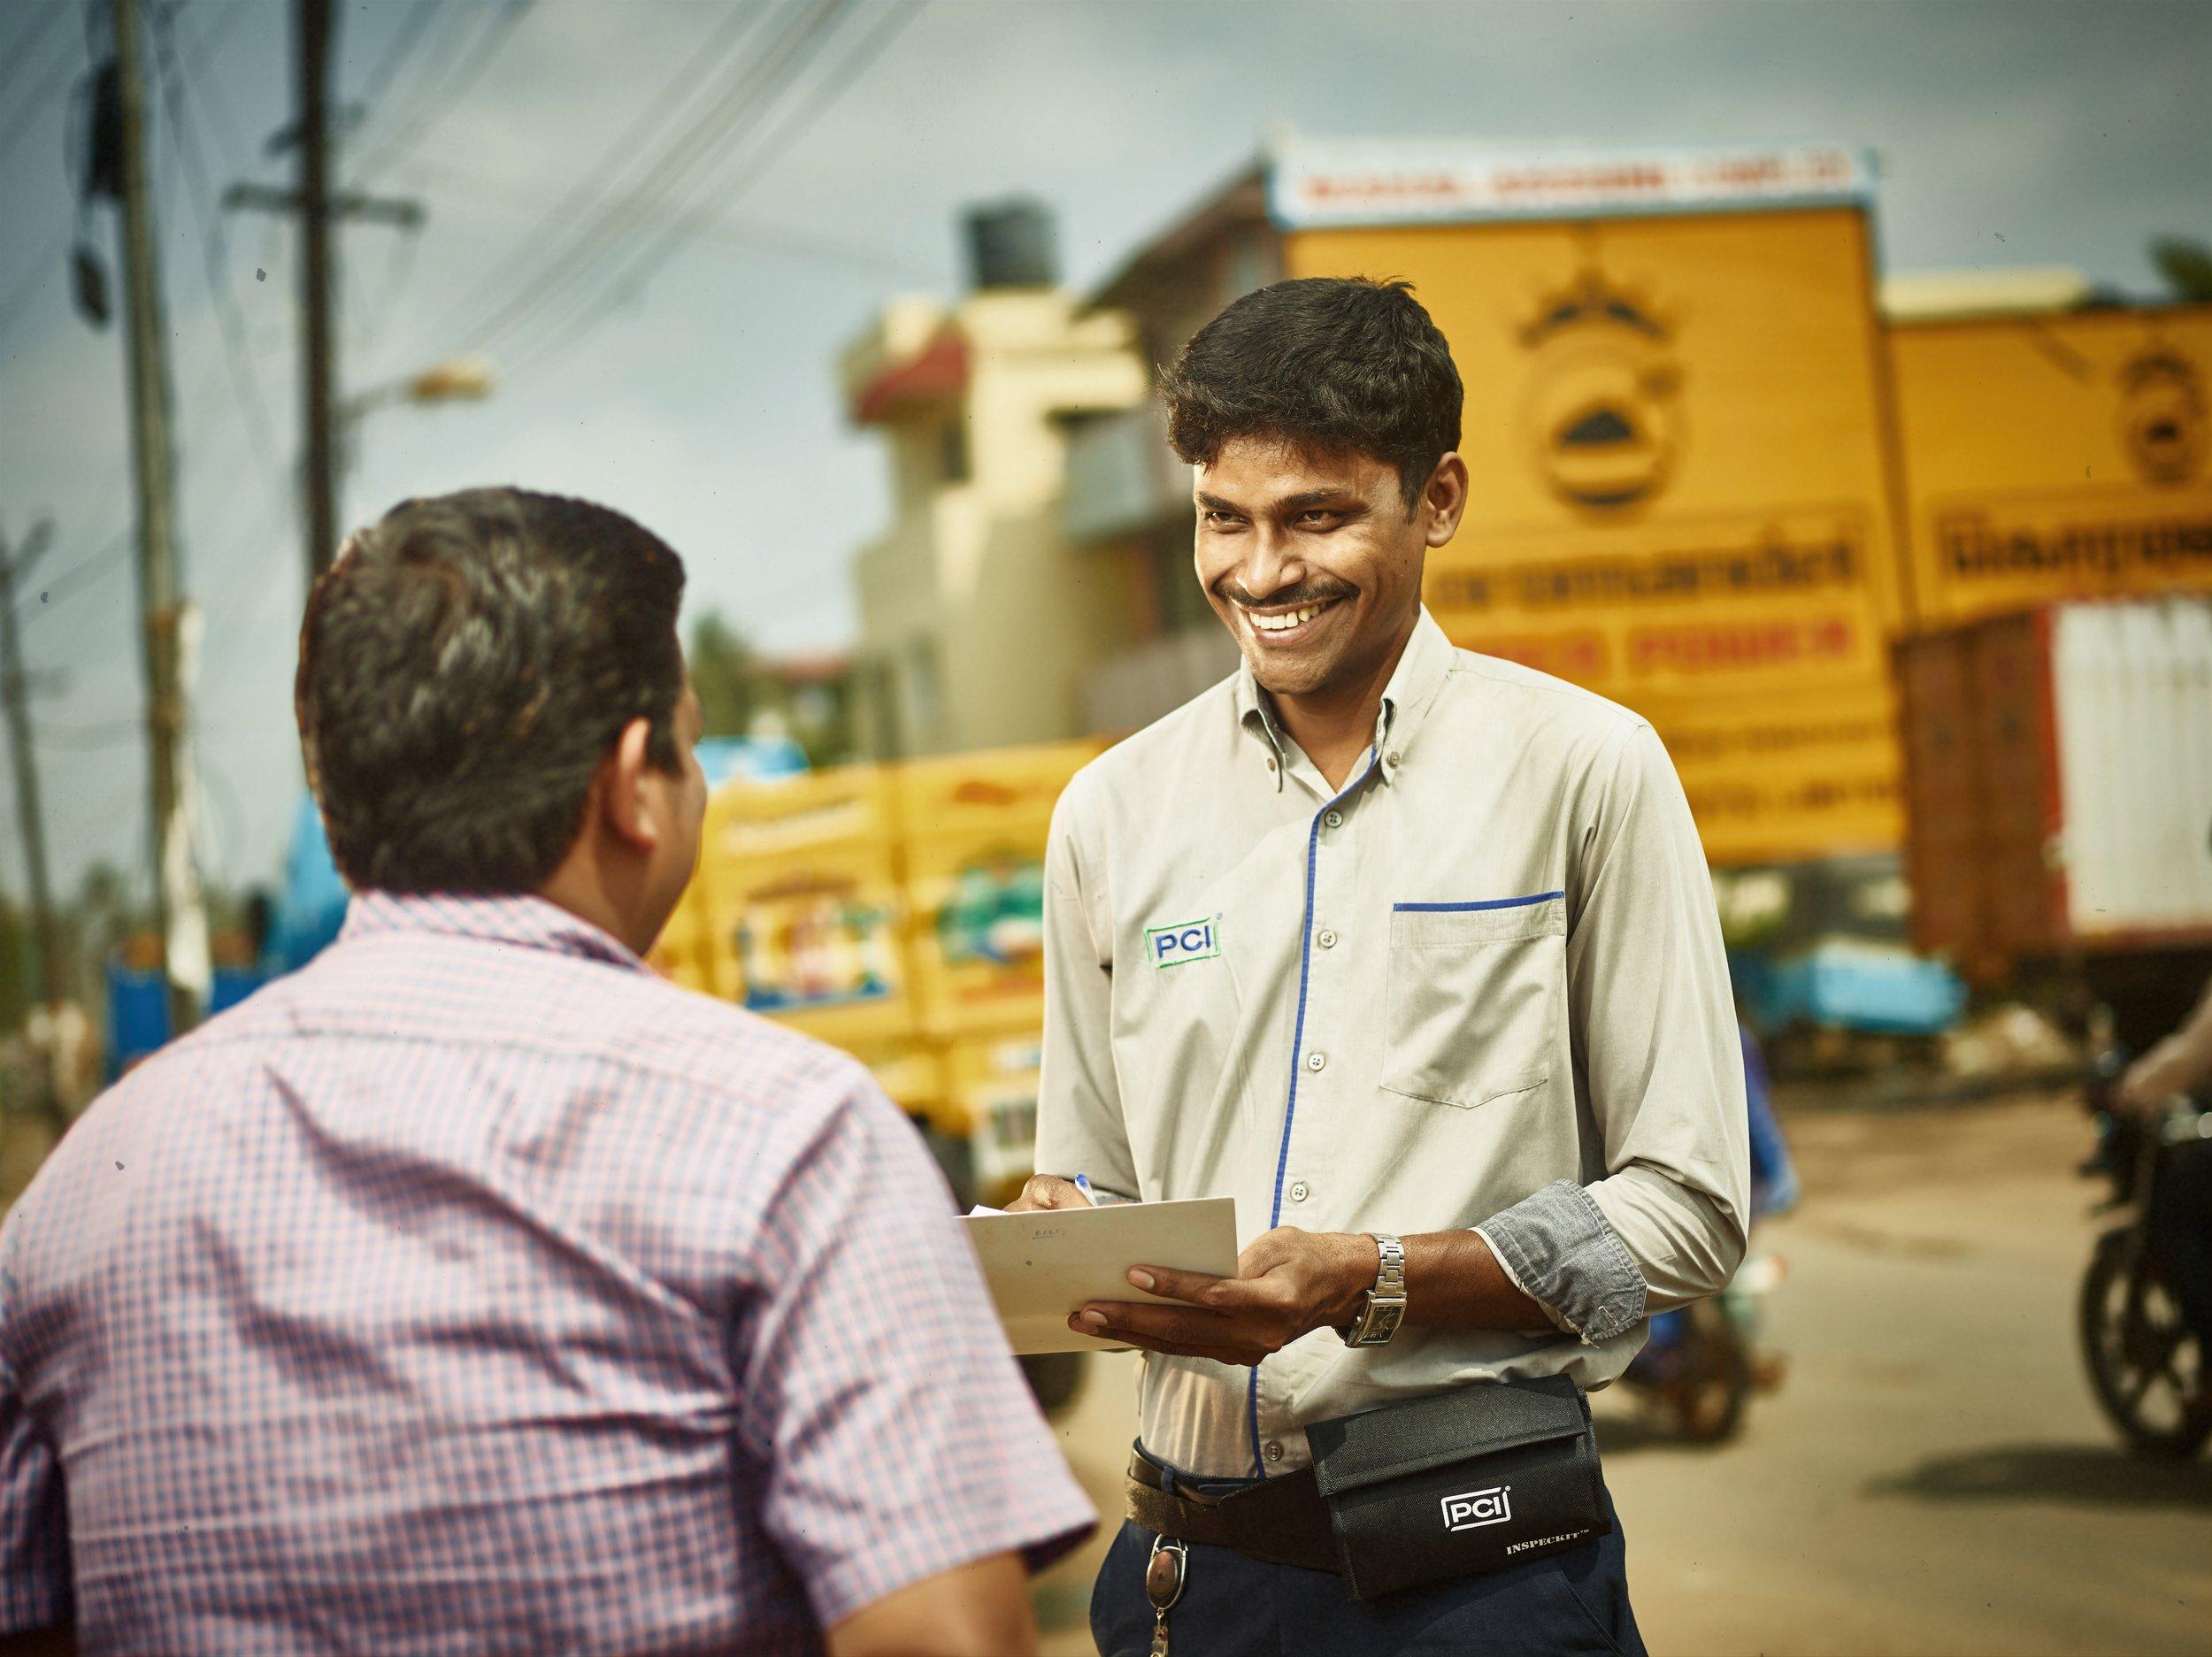 Rentokil India Portraits - Workplace Photography